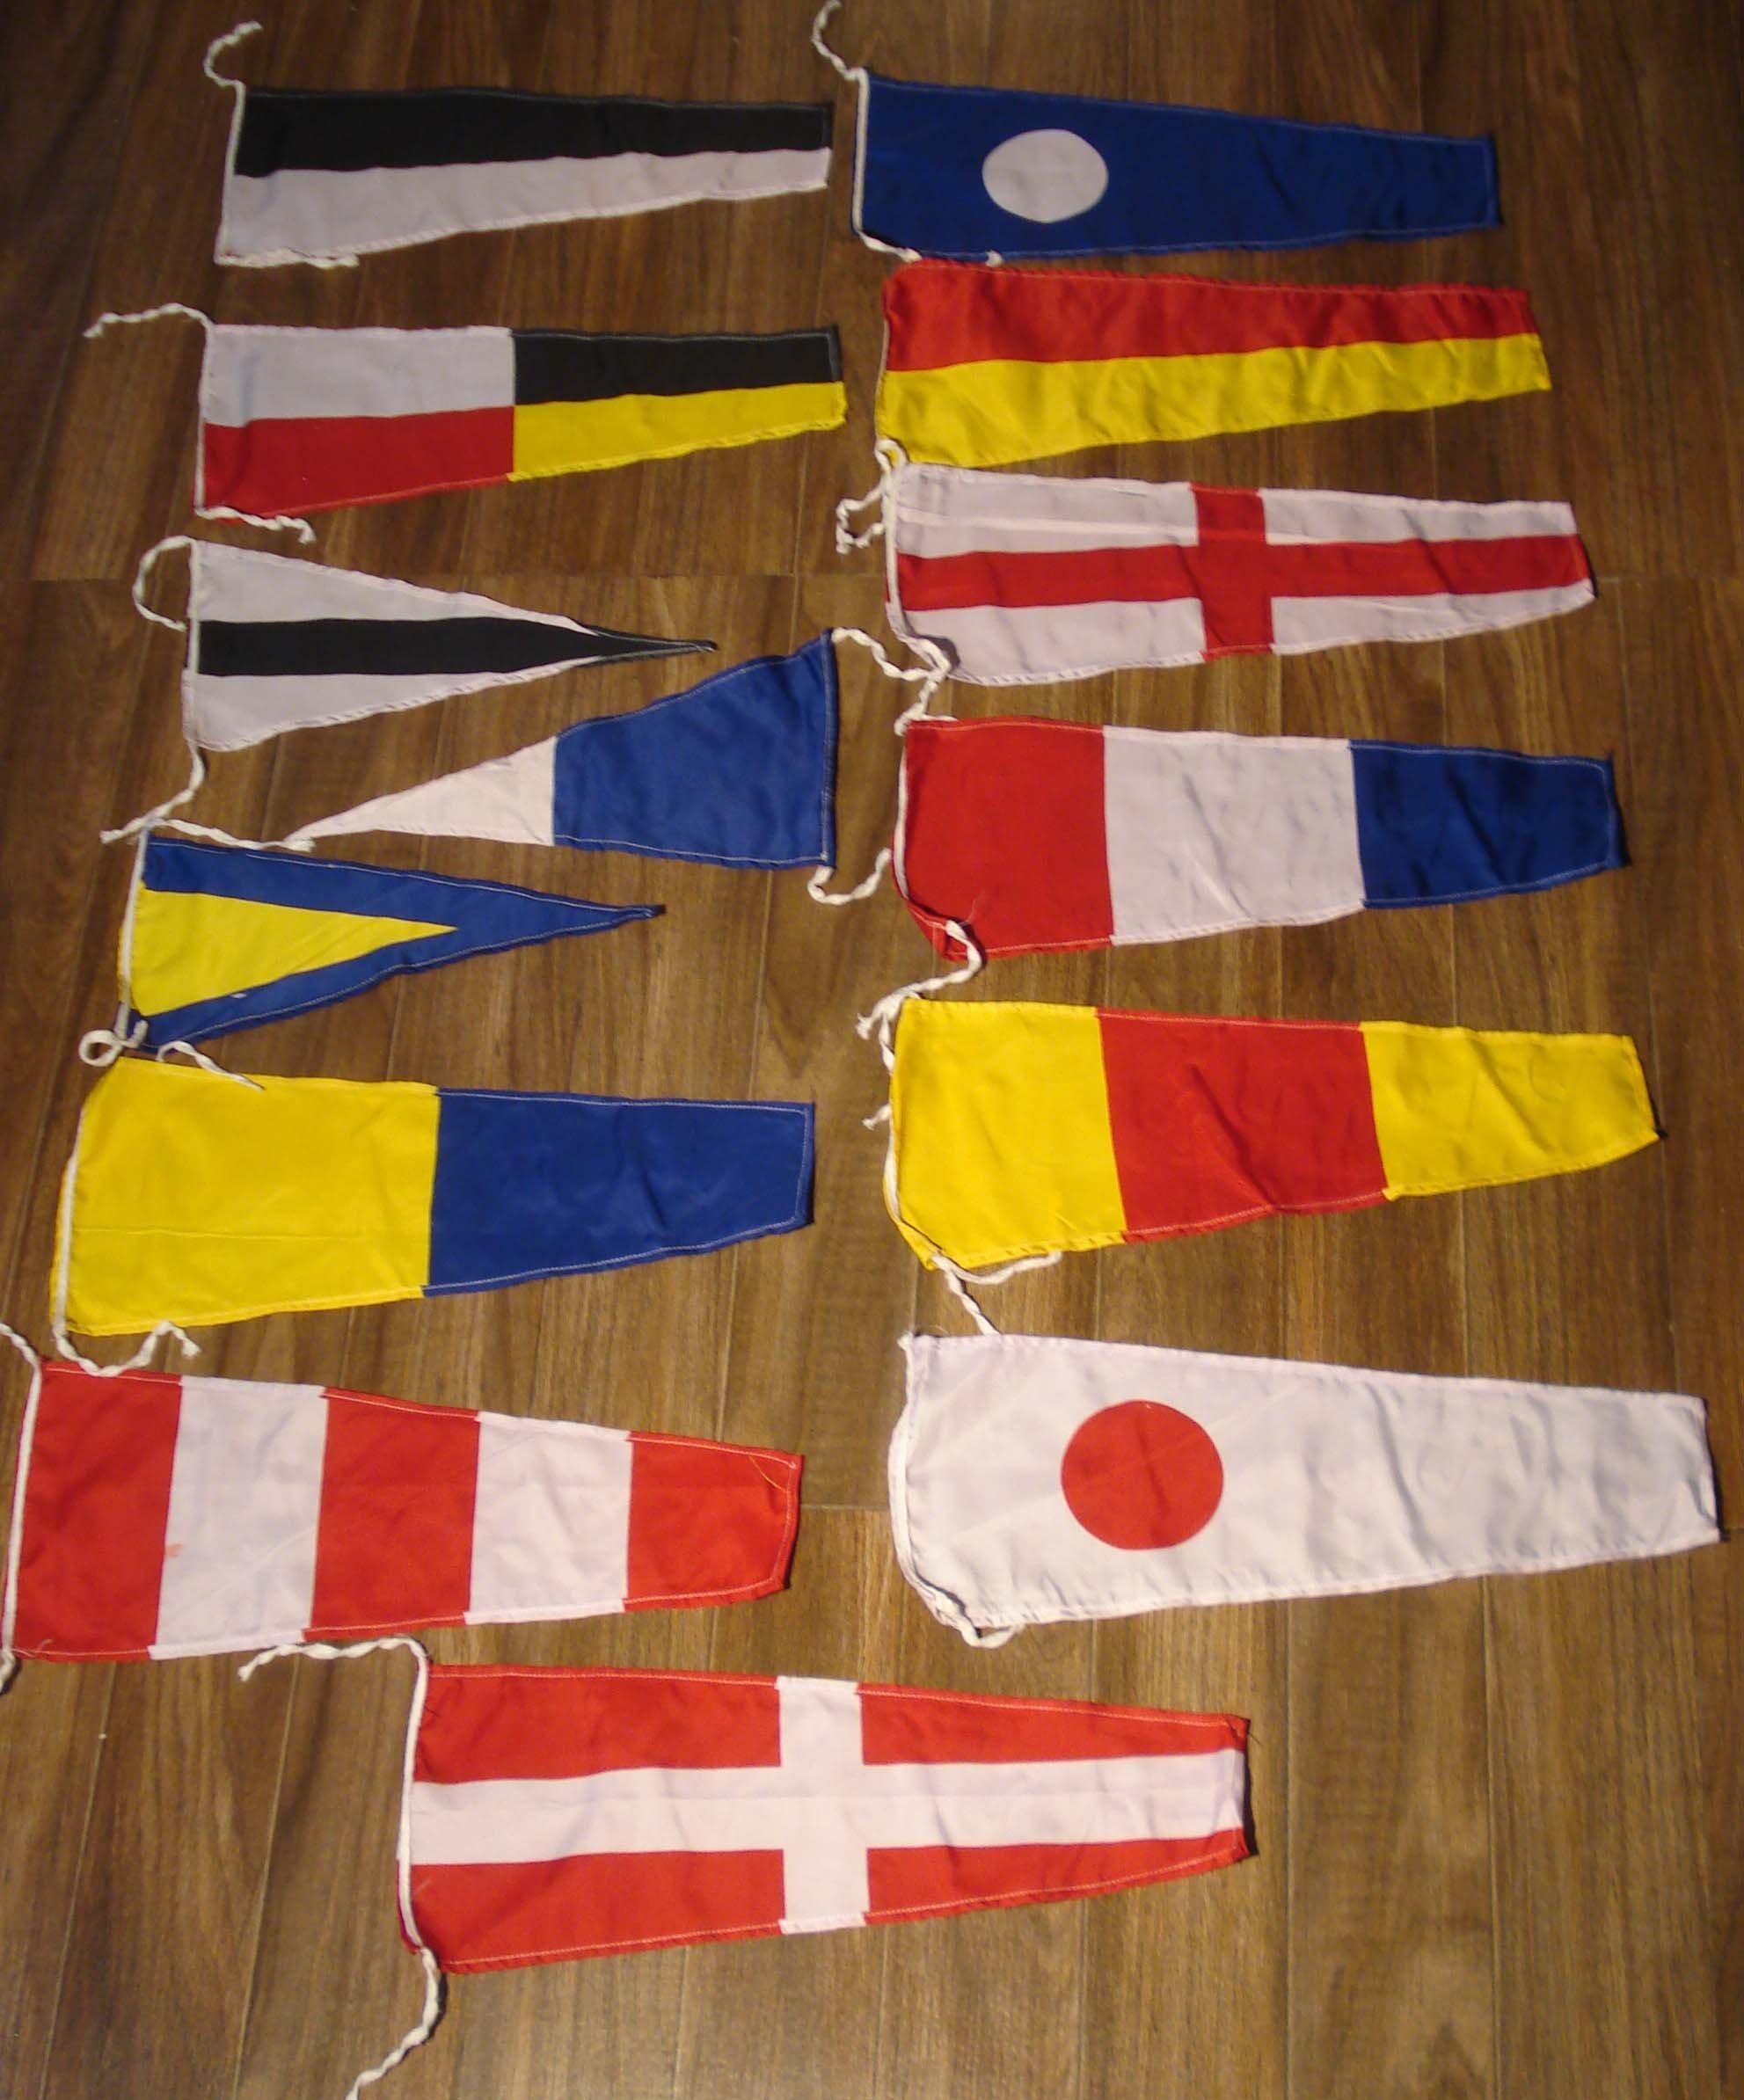 Marine Maritime Signal Flags/Flag Set - Set of 40 Flag with CASE Cover - Nautical/Maritime Boat/Ship / Vessel/Nautical Décor (5100)